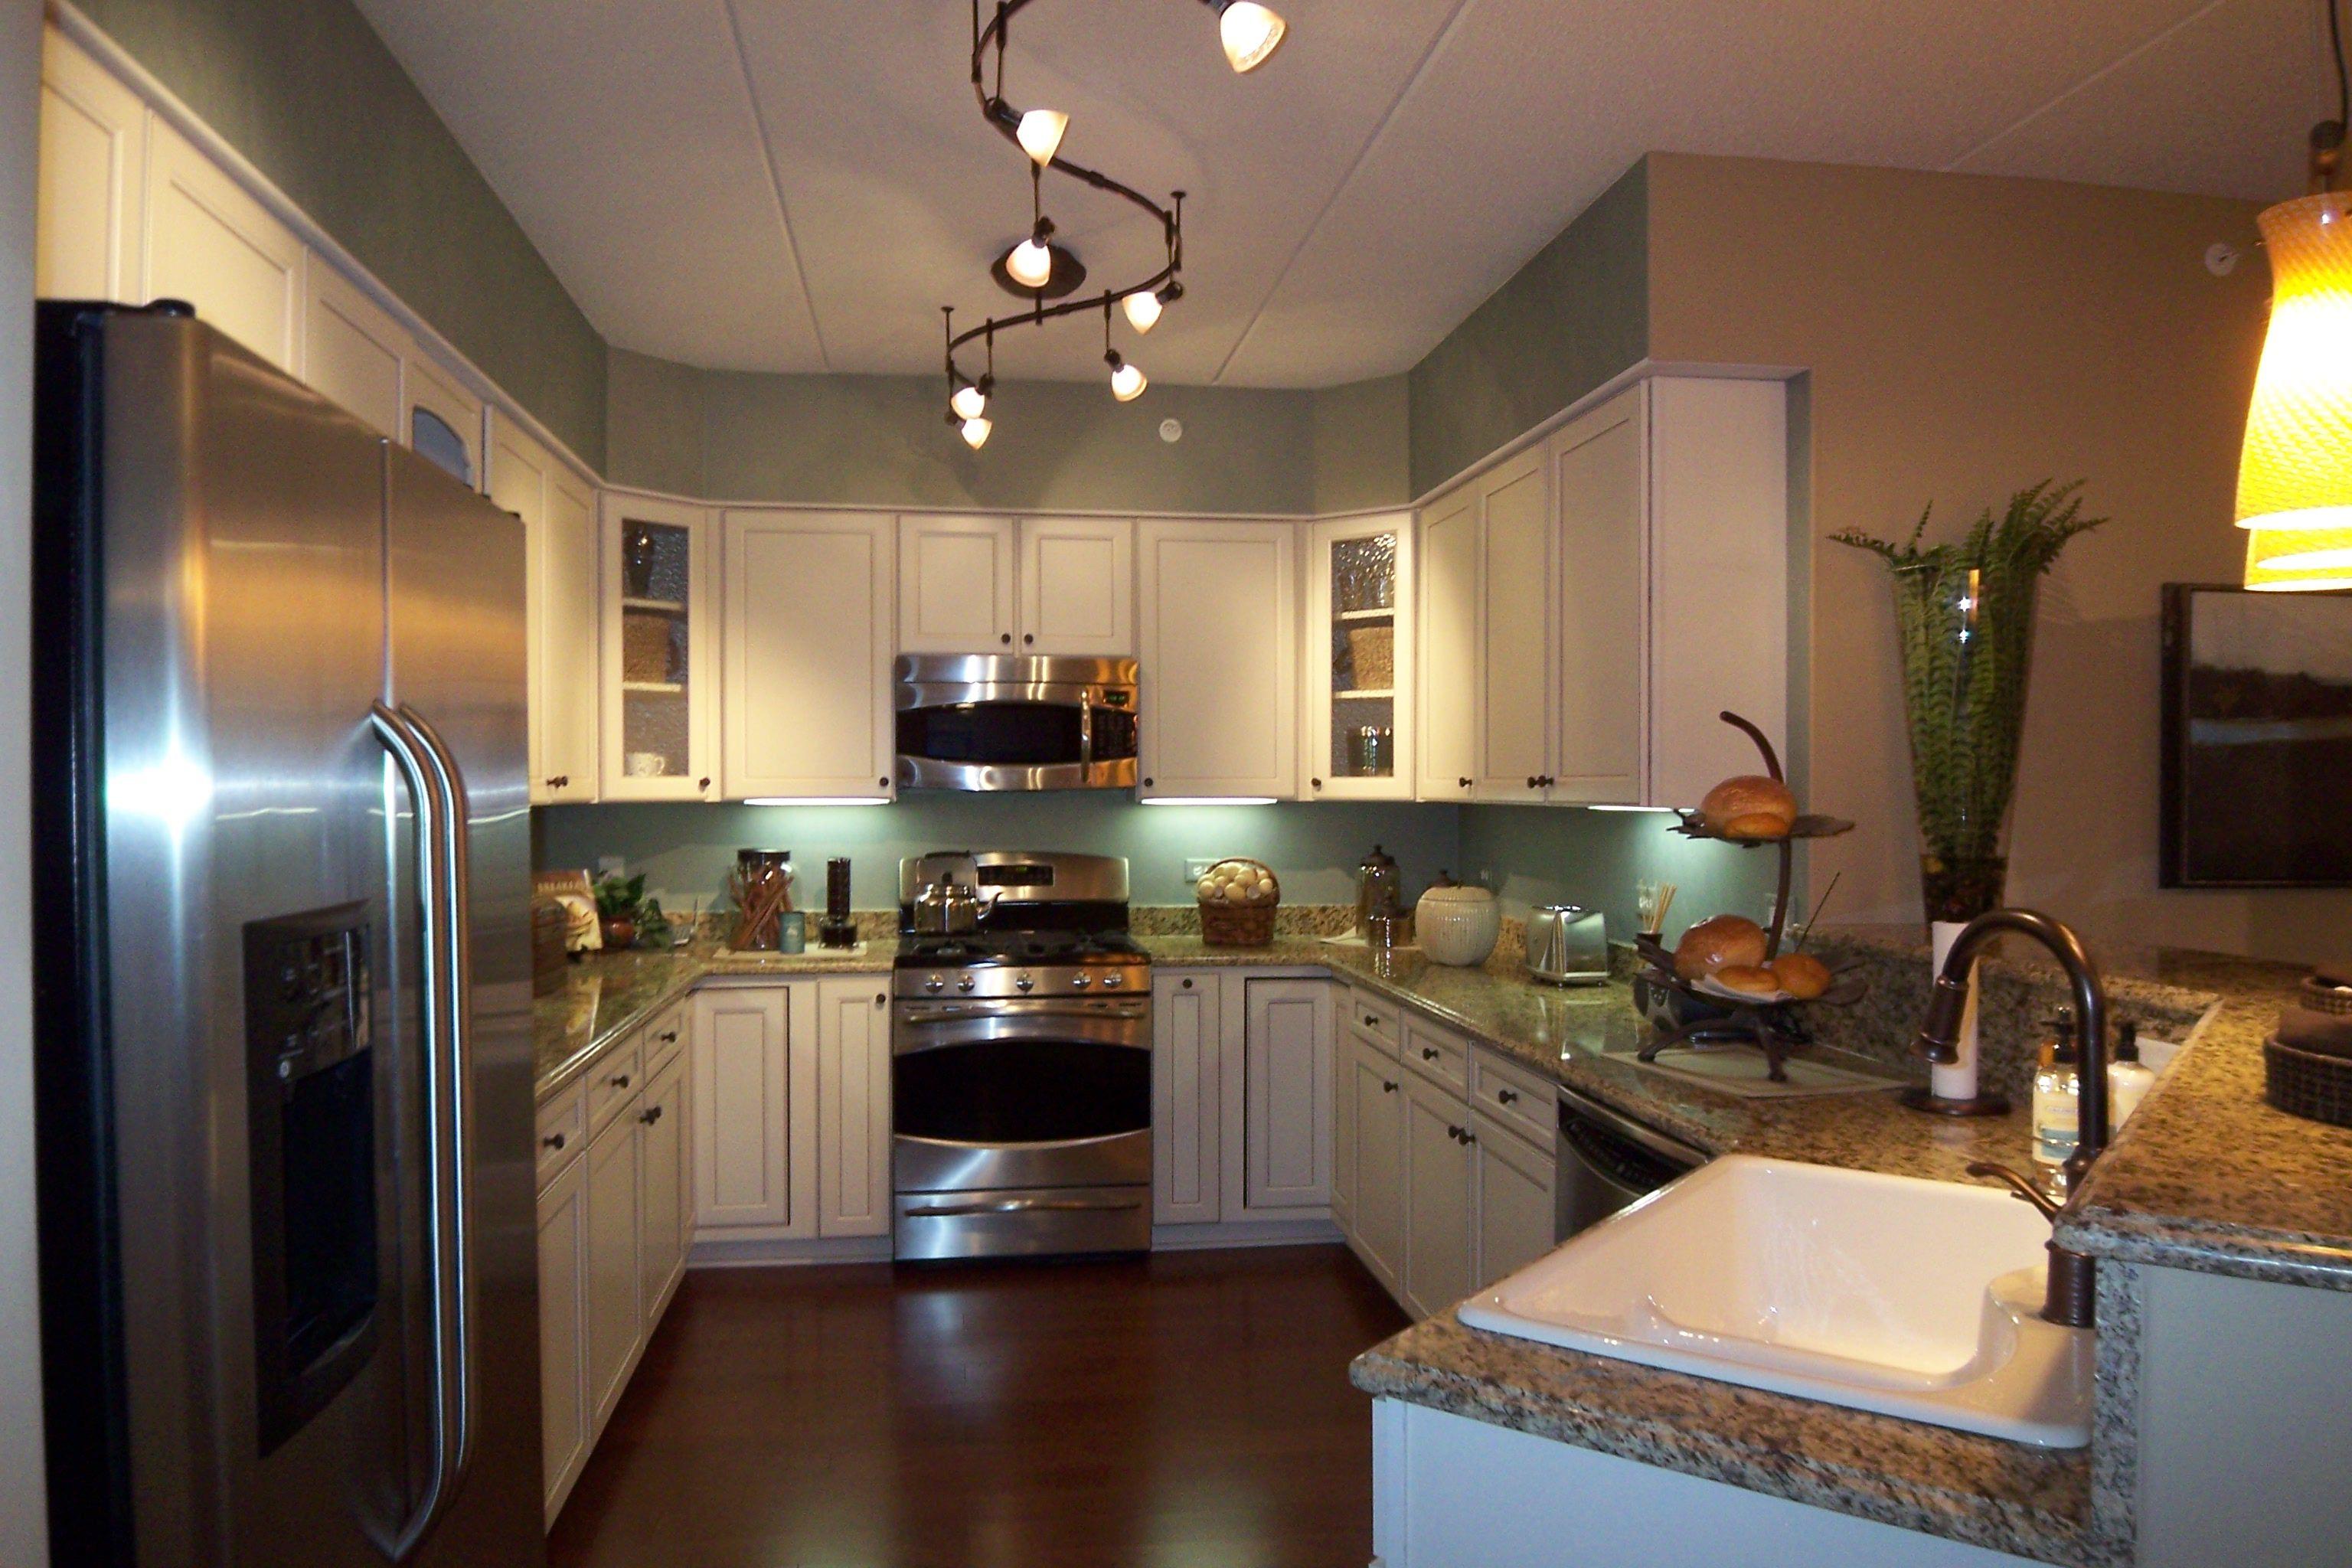 Elegant Track Lighting For Kitchen Ceiling Bb113 Bright Kitchen